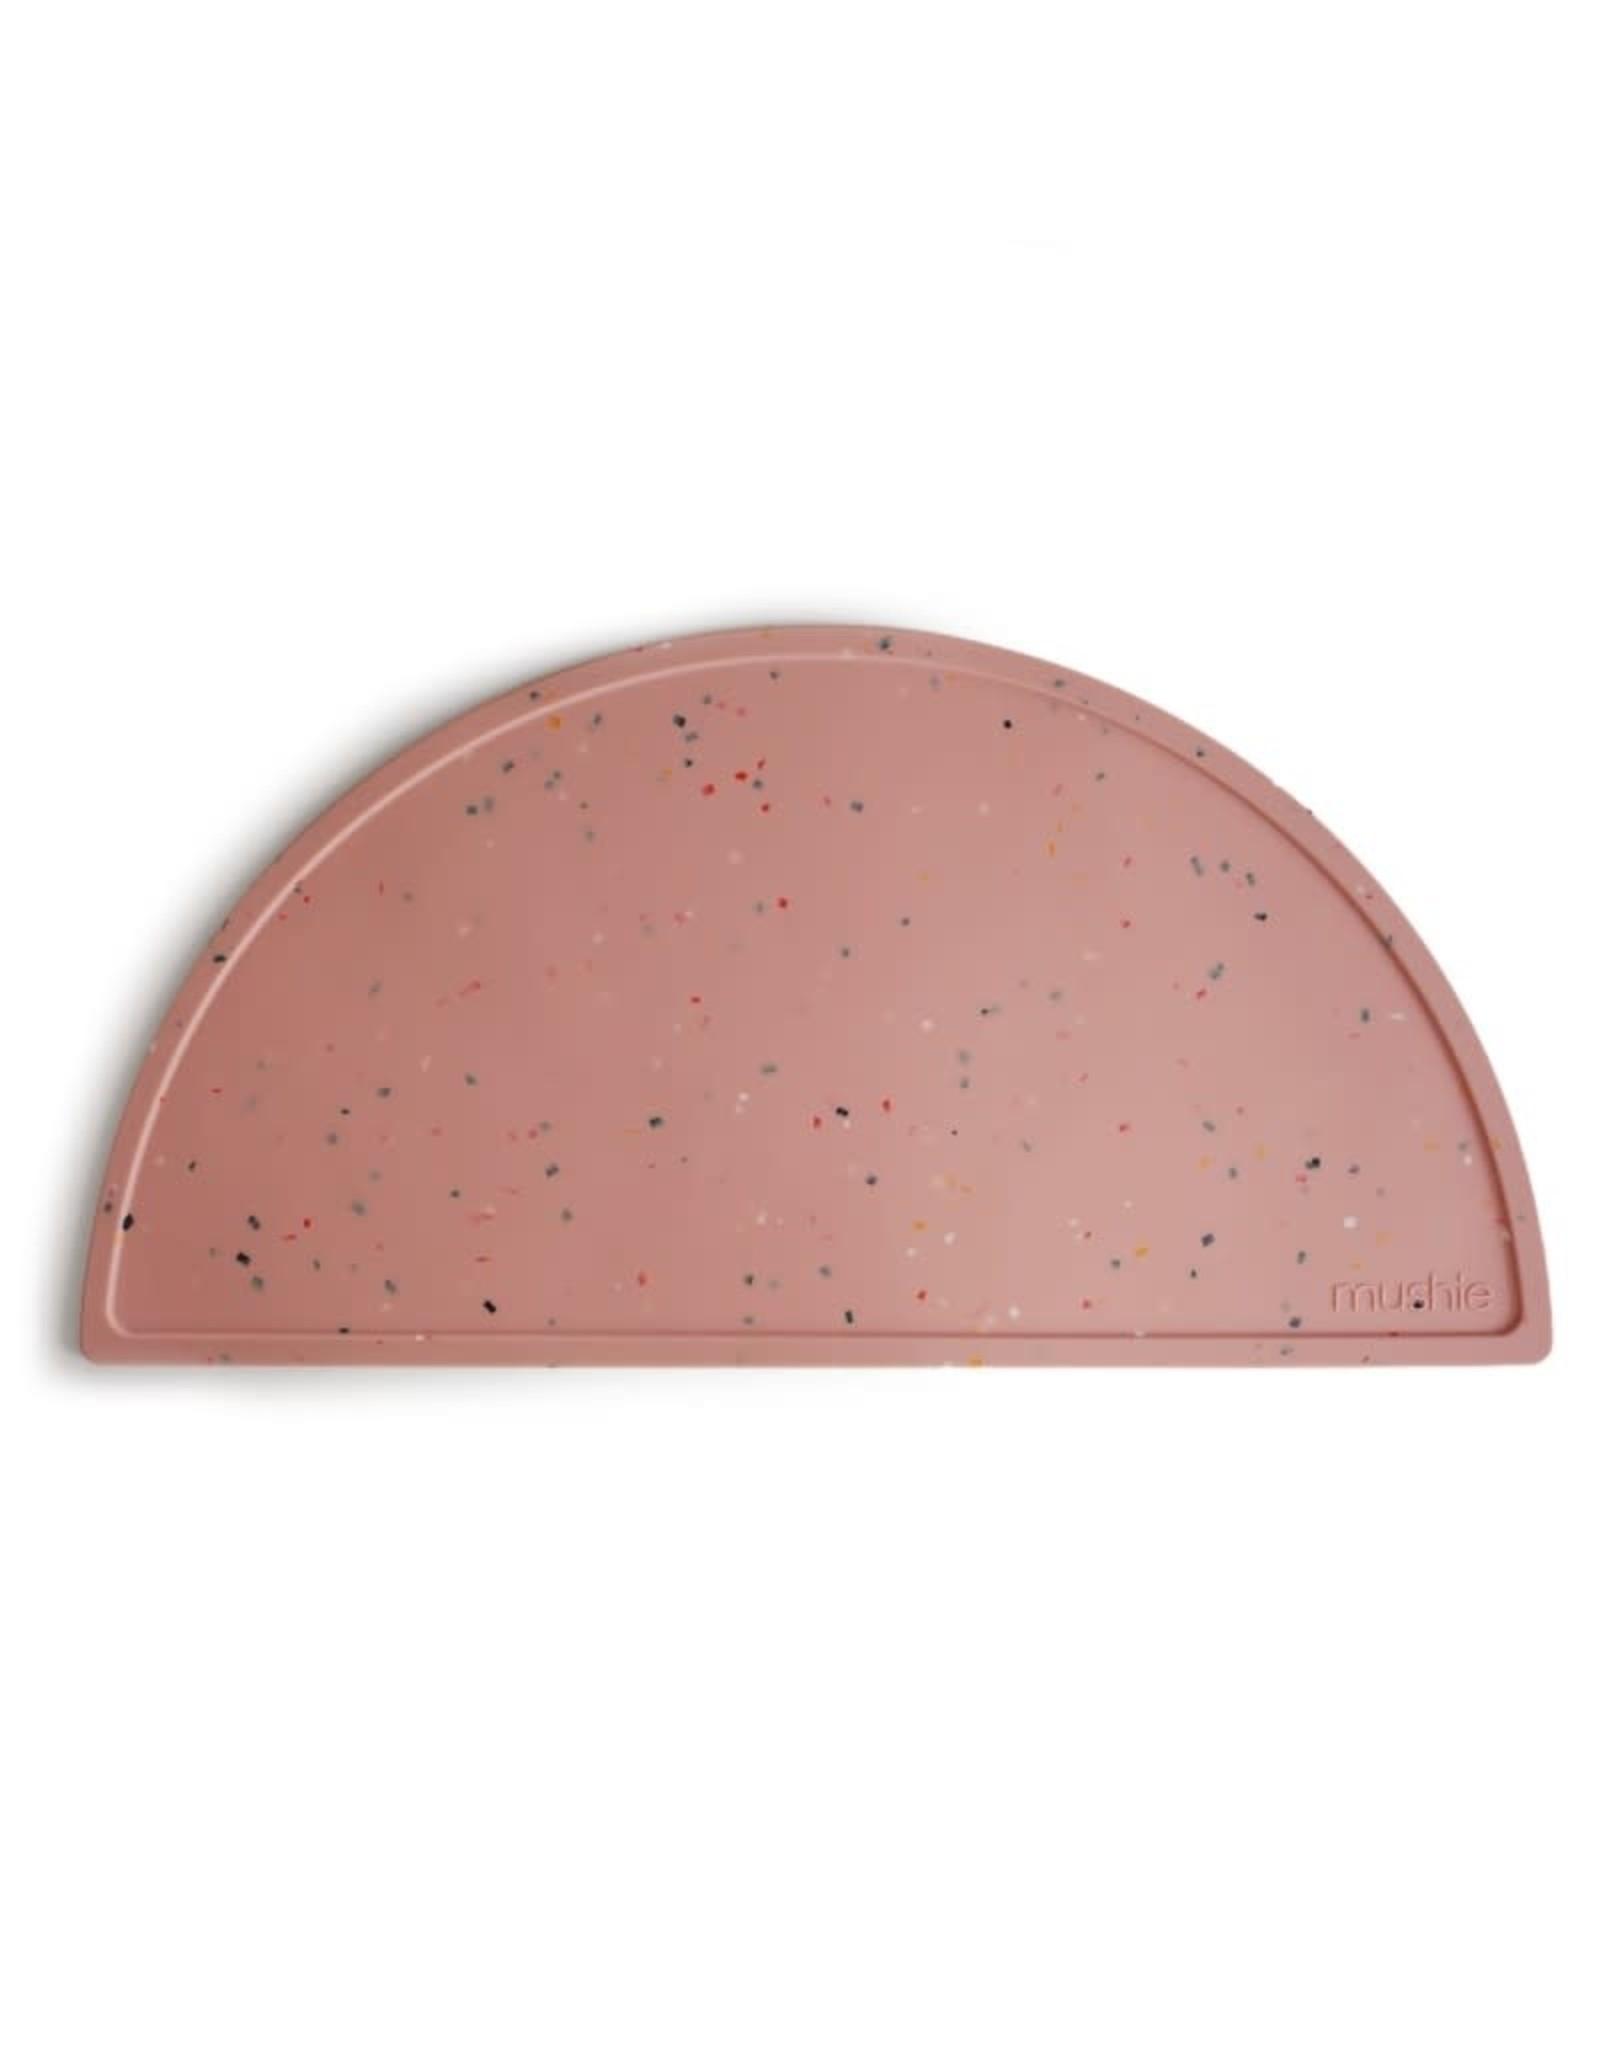 Mushie Set de table en silicone -  Confetti pink powder